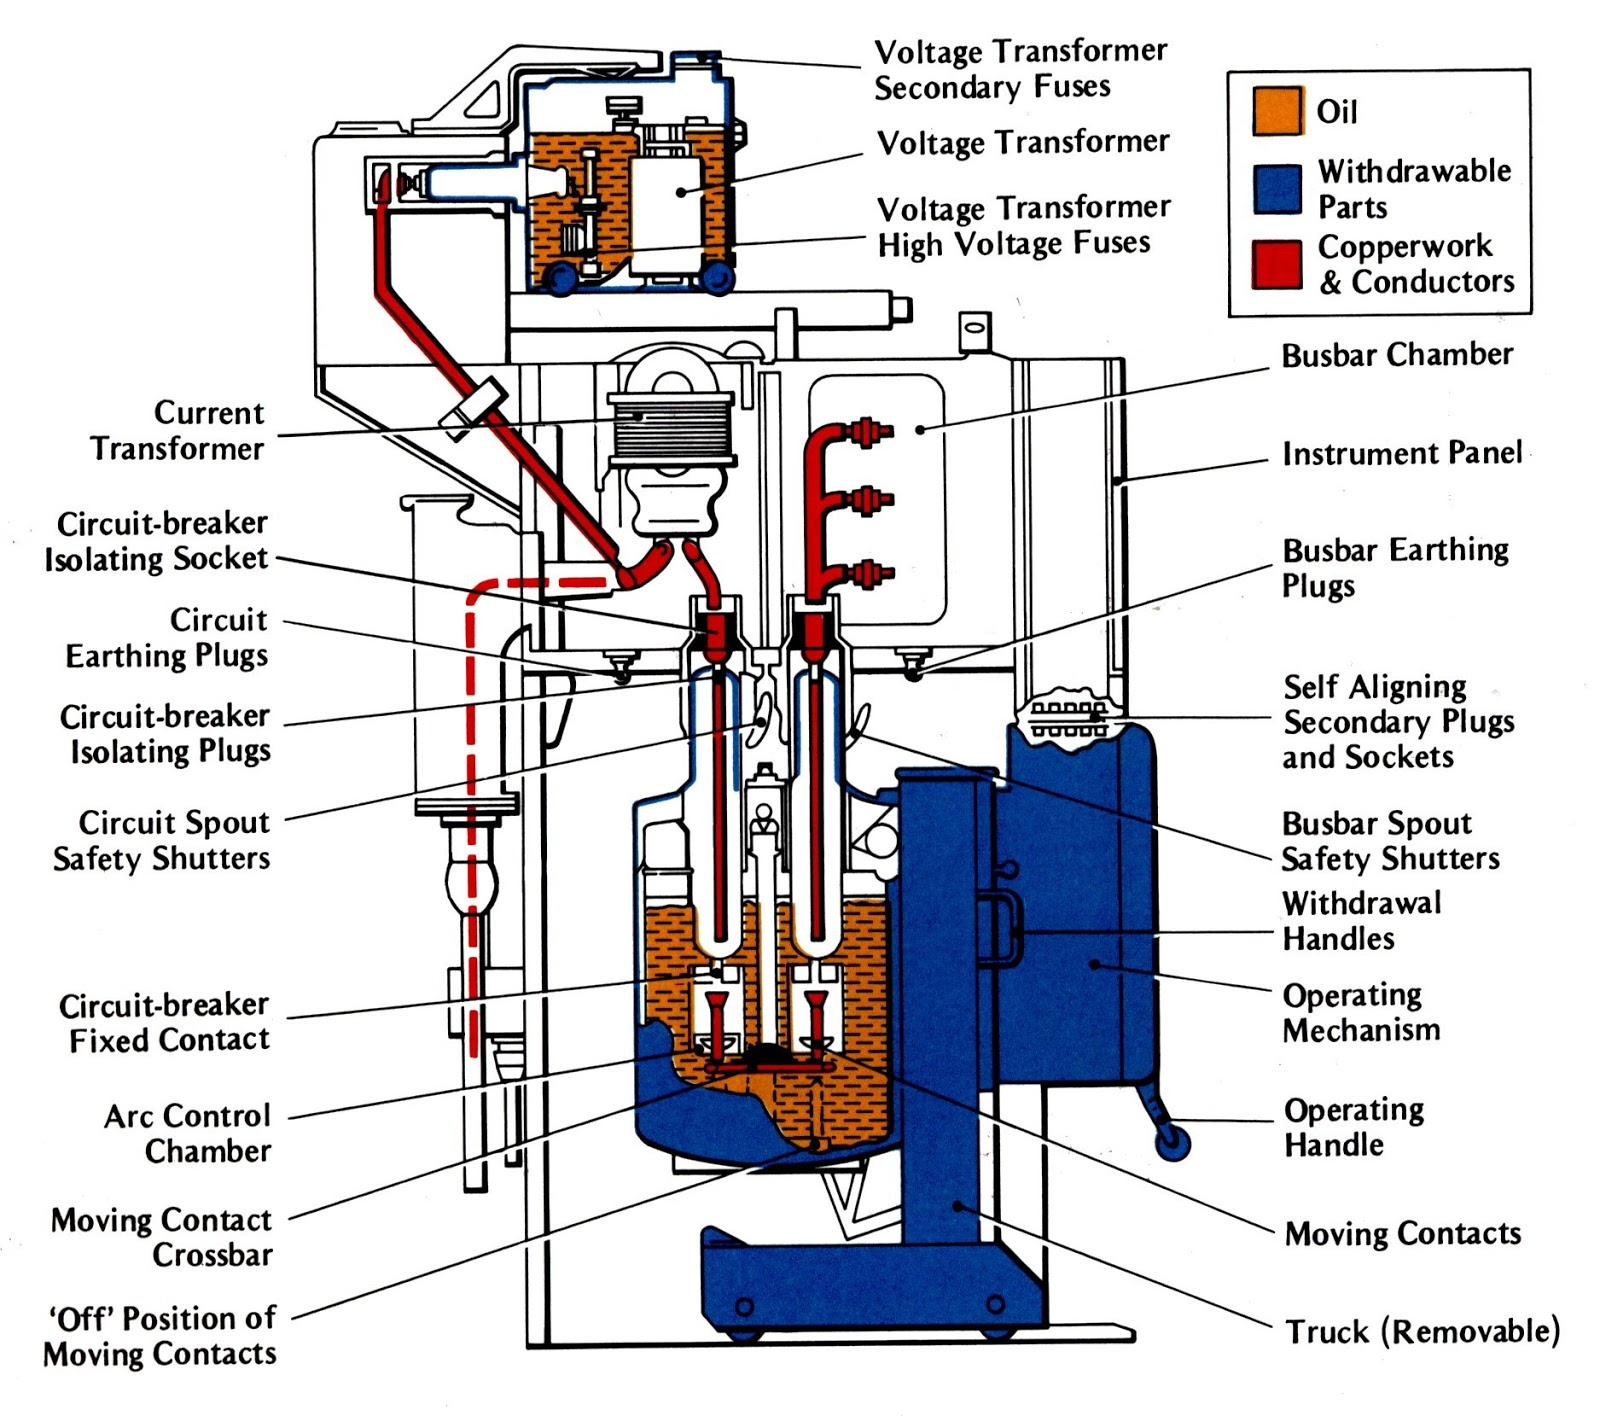 Wiring Diagram Substation Trane Weathertron Heat Pump Thermostat High Voltage Sub Station Get Free Image